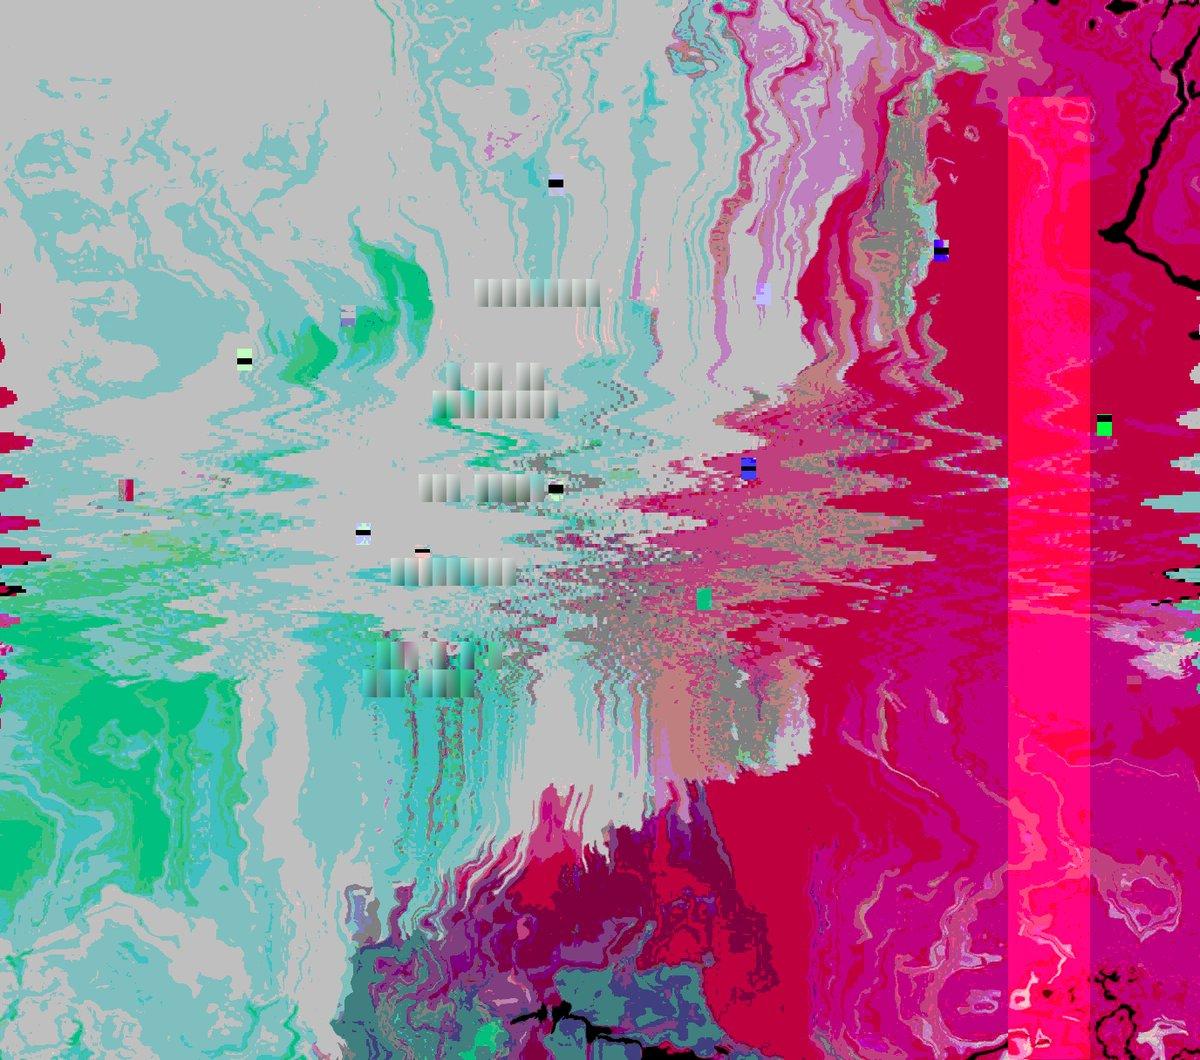 ⭐💠 glitchart glitch mandelbrot fractalart artsy abstractart creative bot Origin img by @Kisalamusic